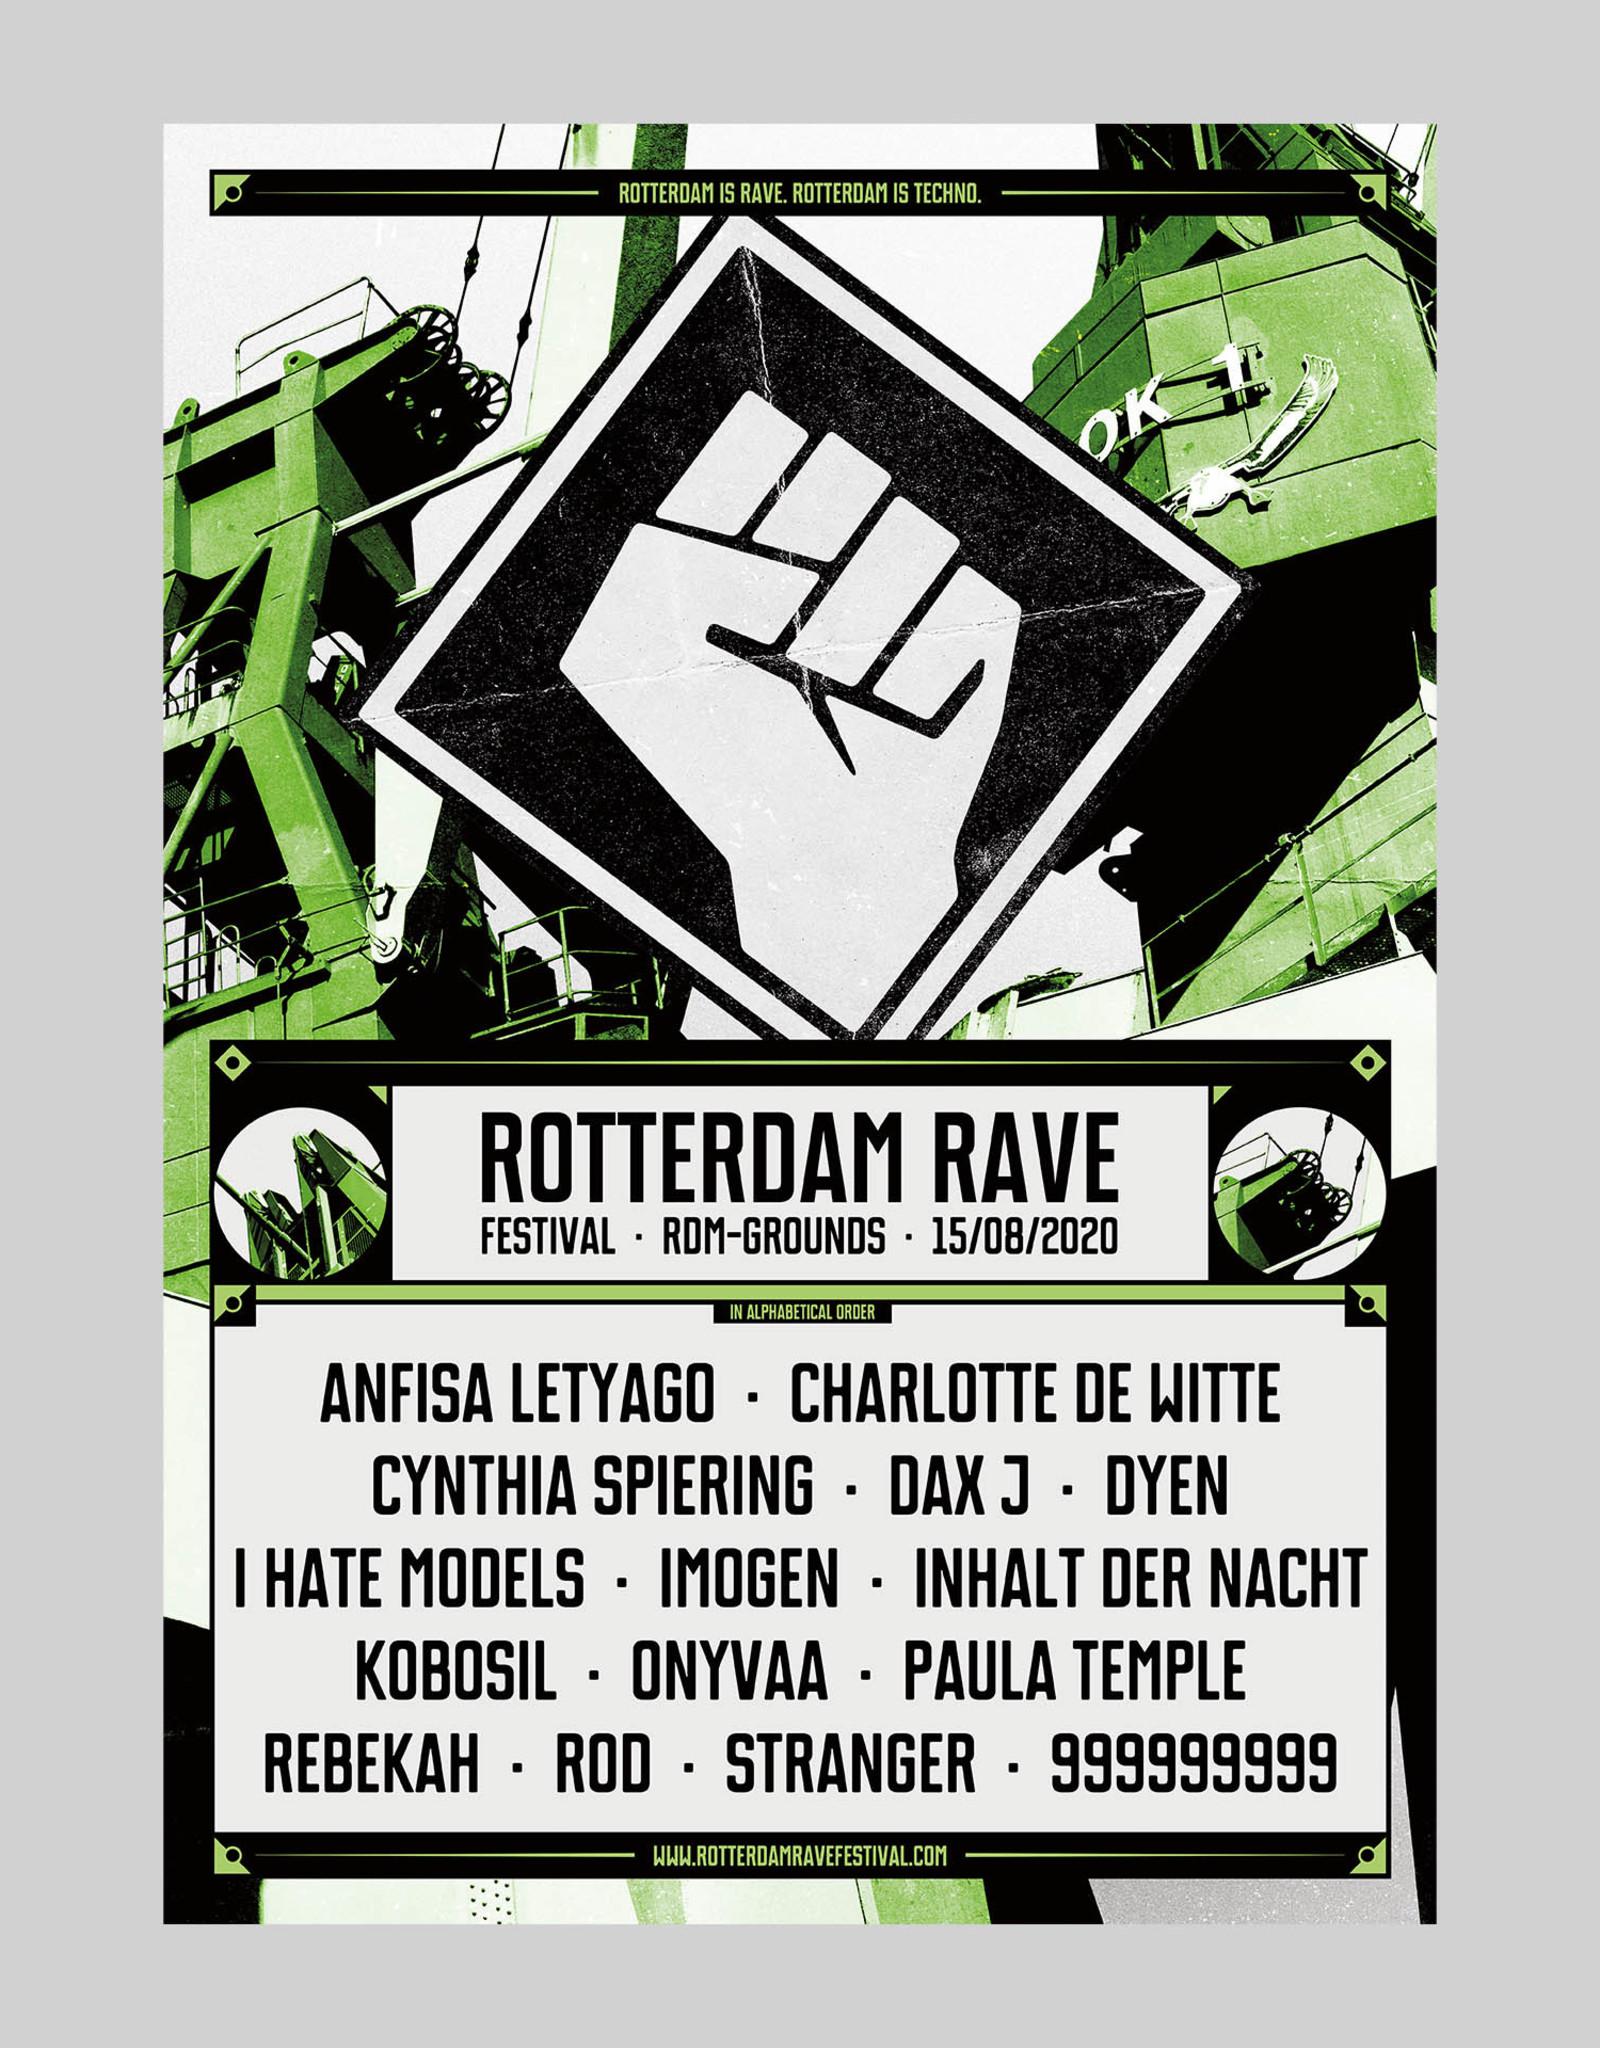 Rotterdam Rave Rotterdam Rave Poster Festival 2020